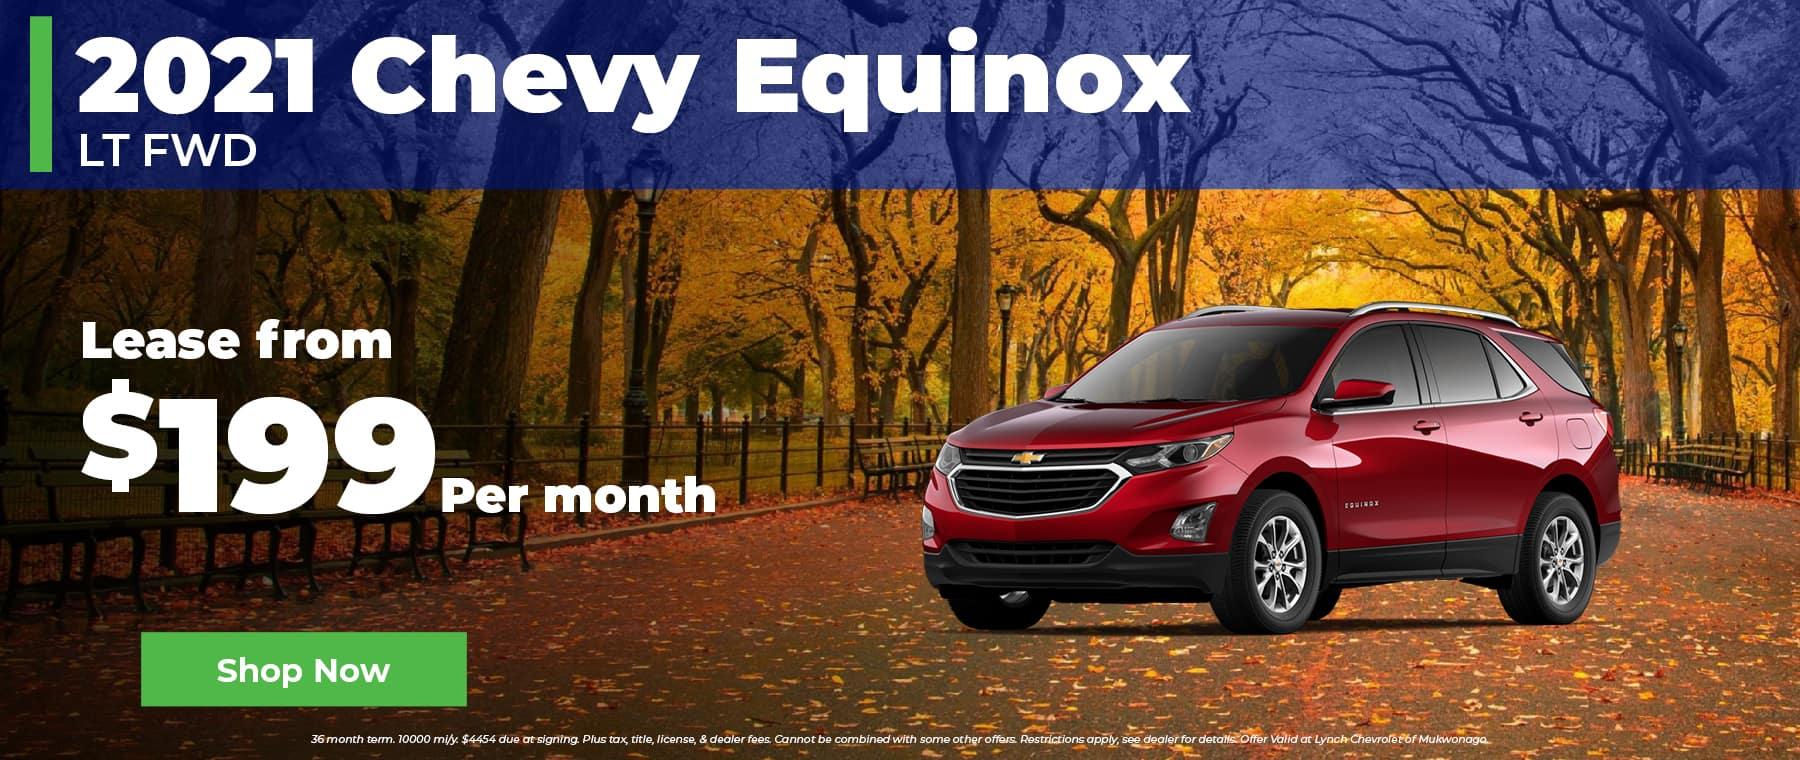 2021 Chevy Equinox $199 per month in Mukwonago WI